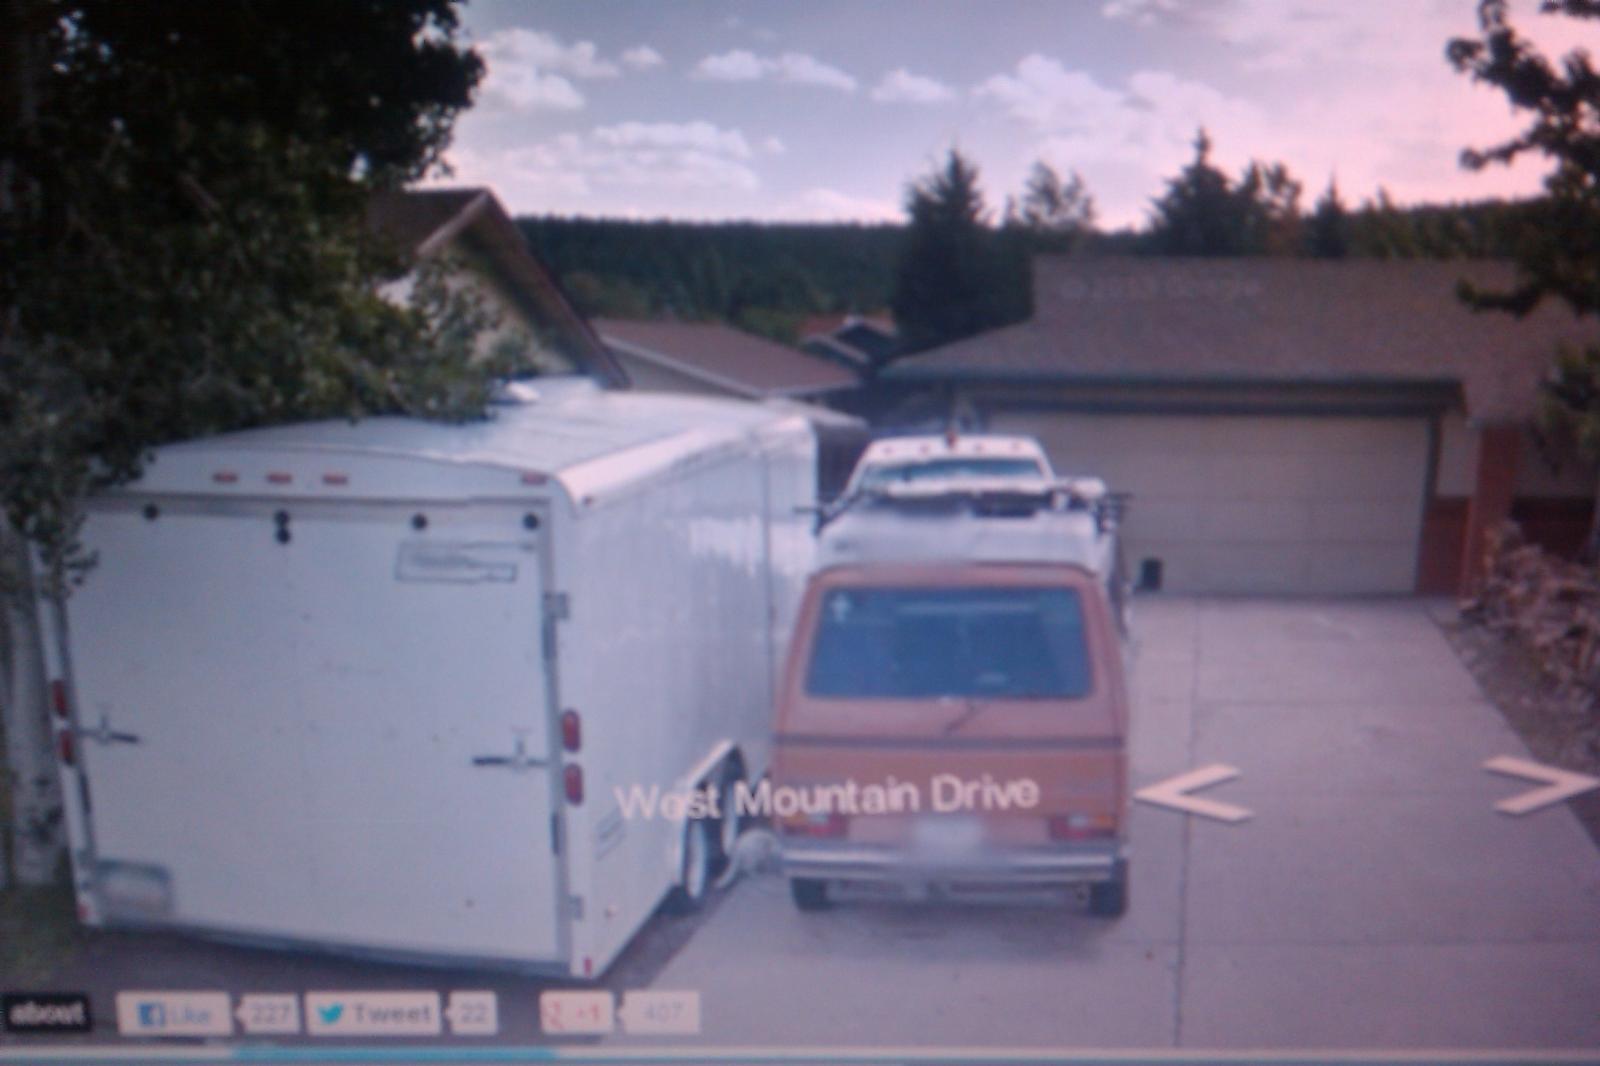 Google van street view